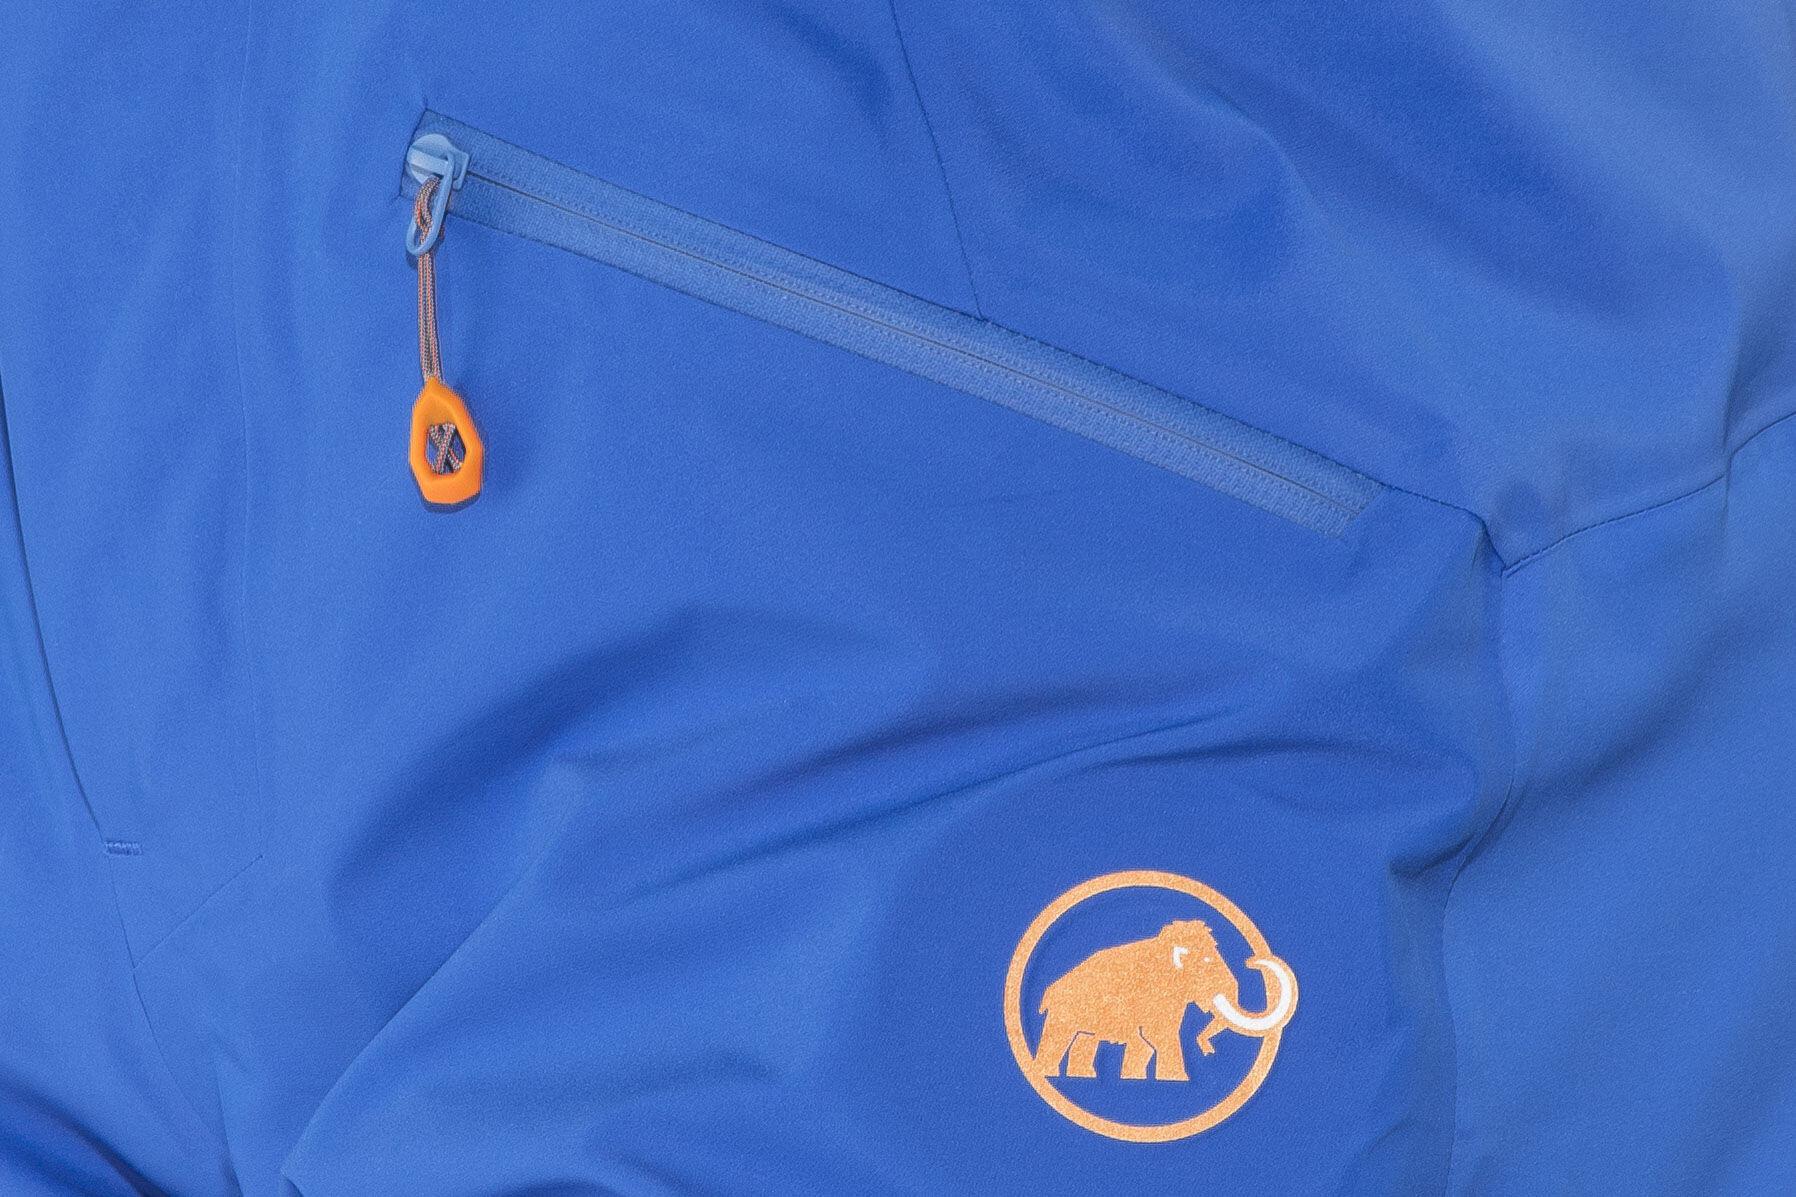 Klettergurt Mammut Größentabelle : Mammut nordwand pro hs pants men ice campz.de